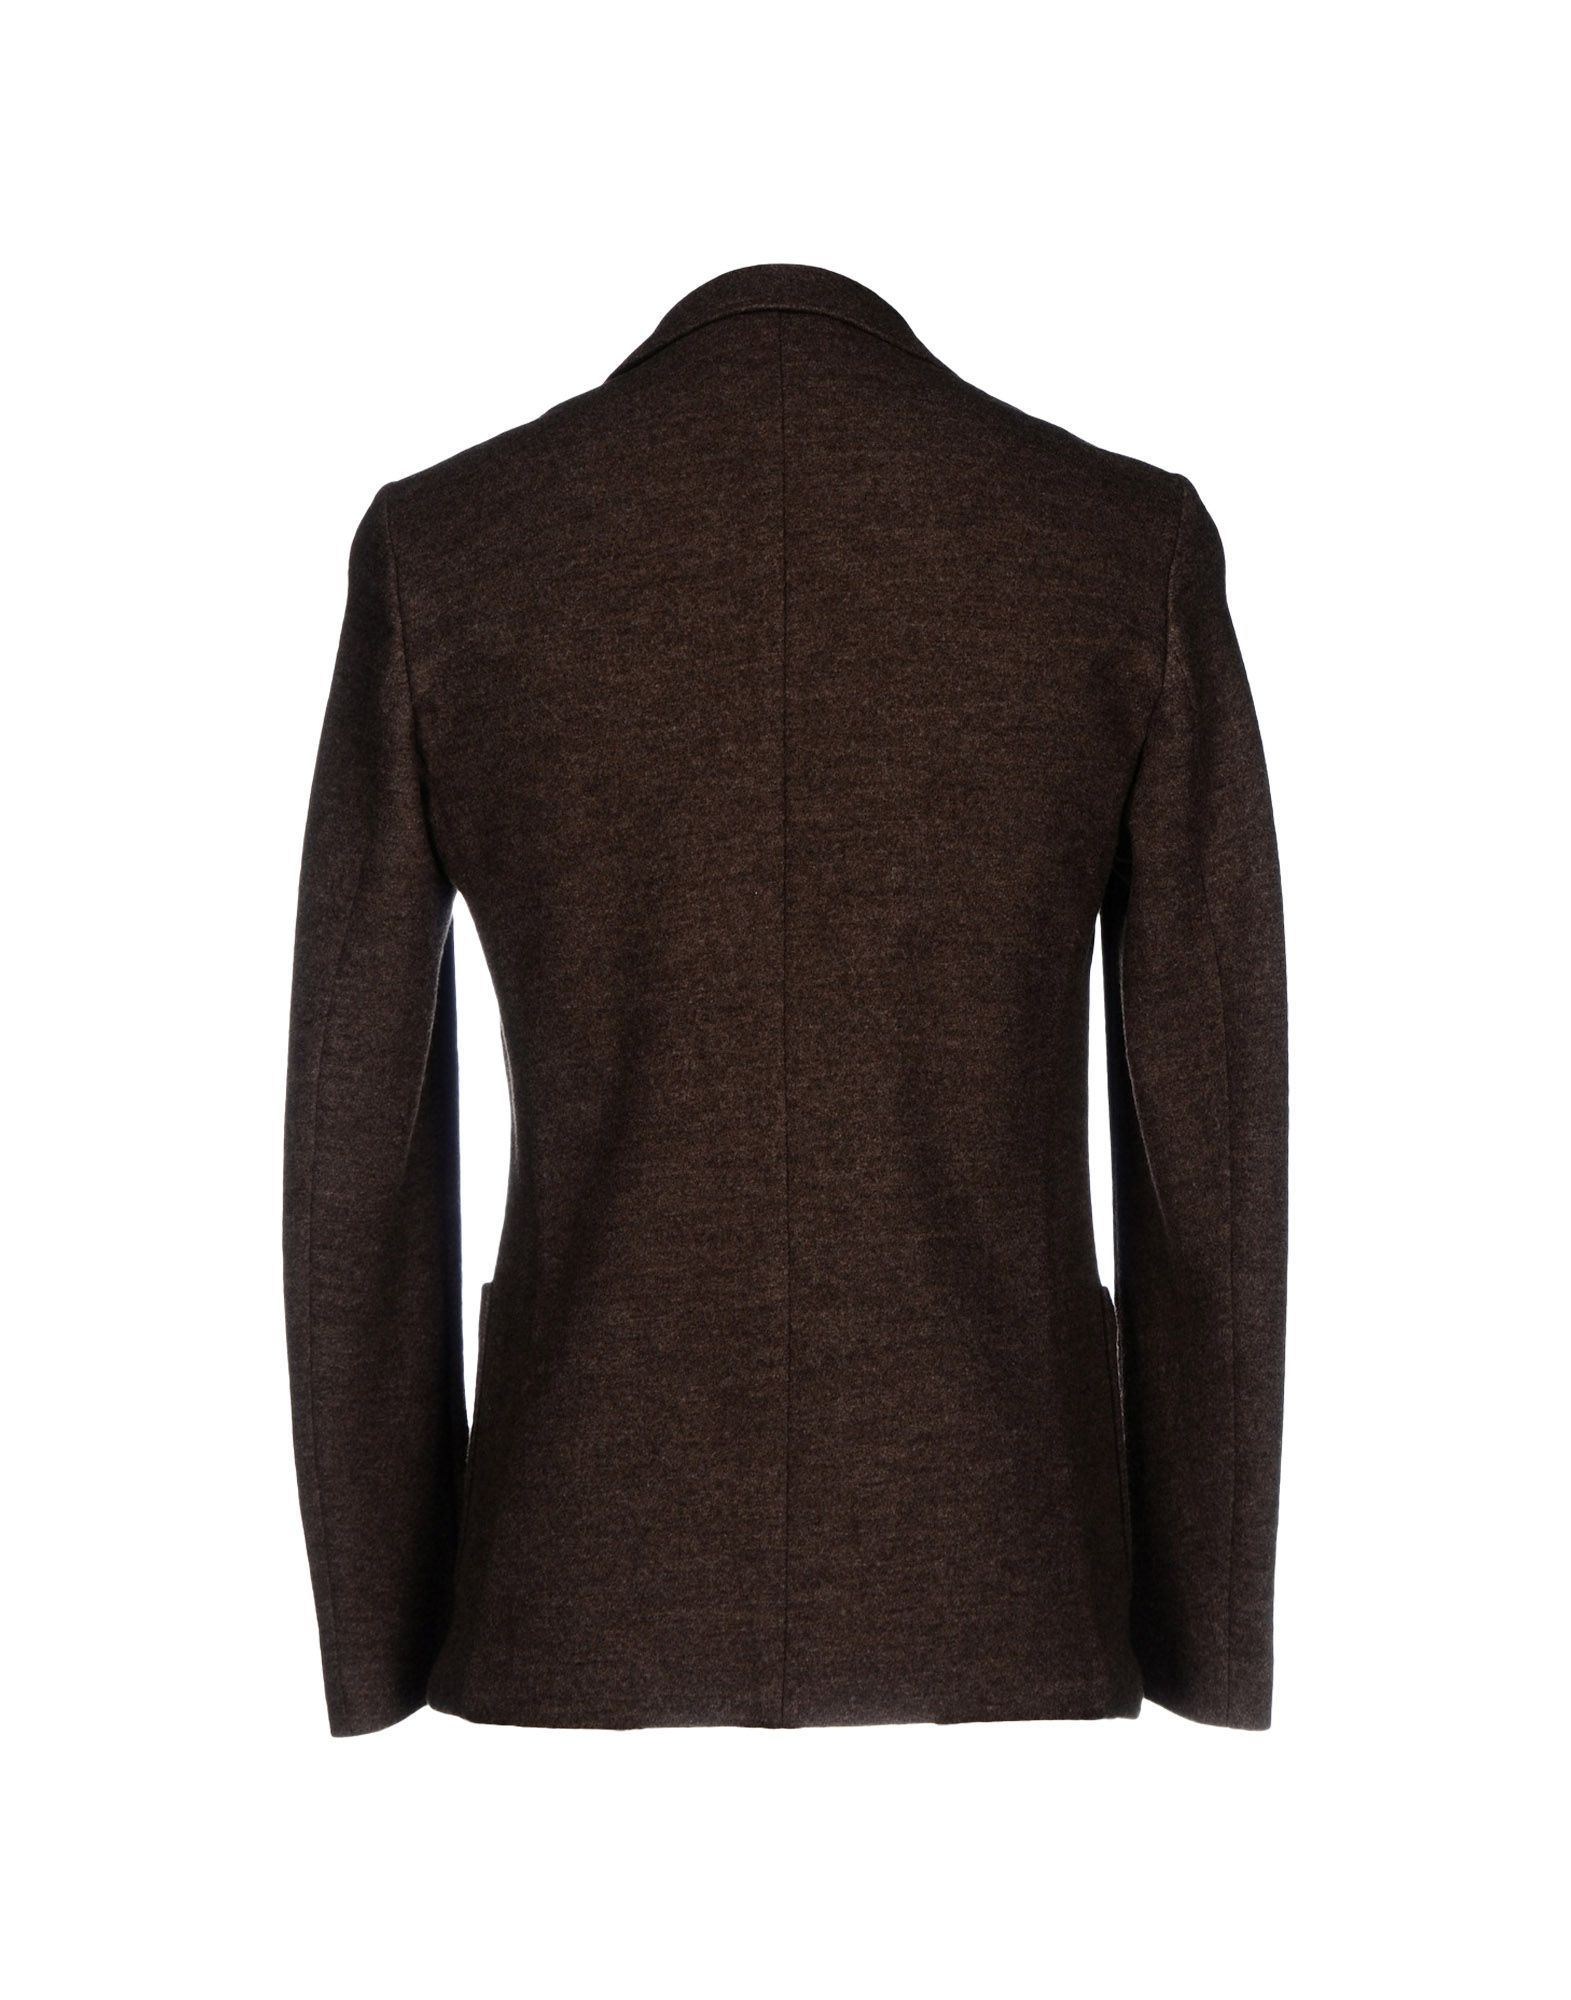 SUITS AND JACKETS Seventy Sergio Tegon Khaki Man Virgin Wool